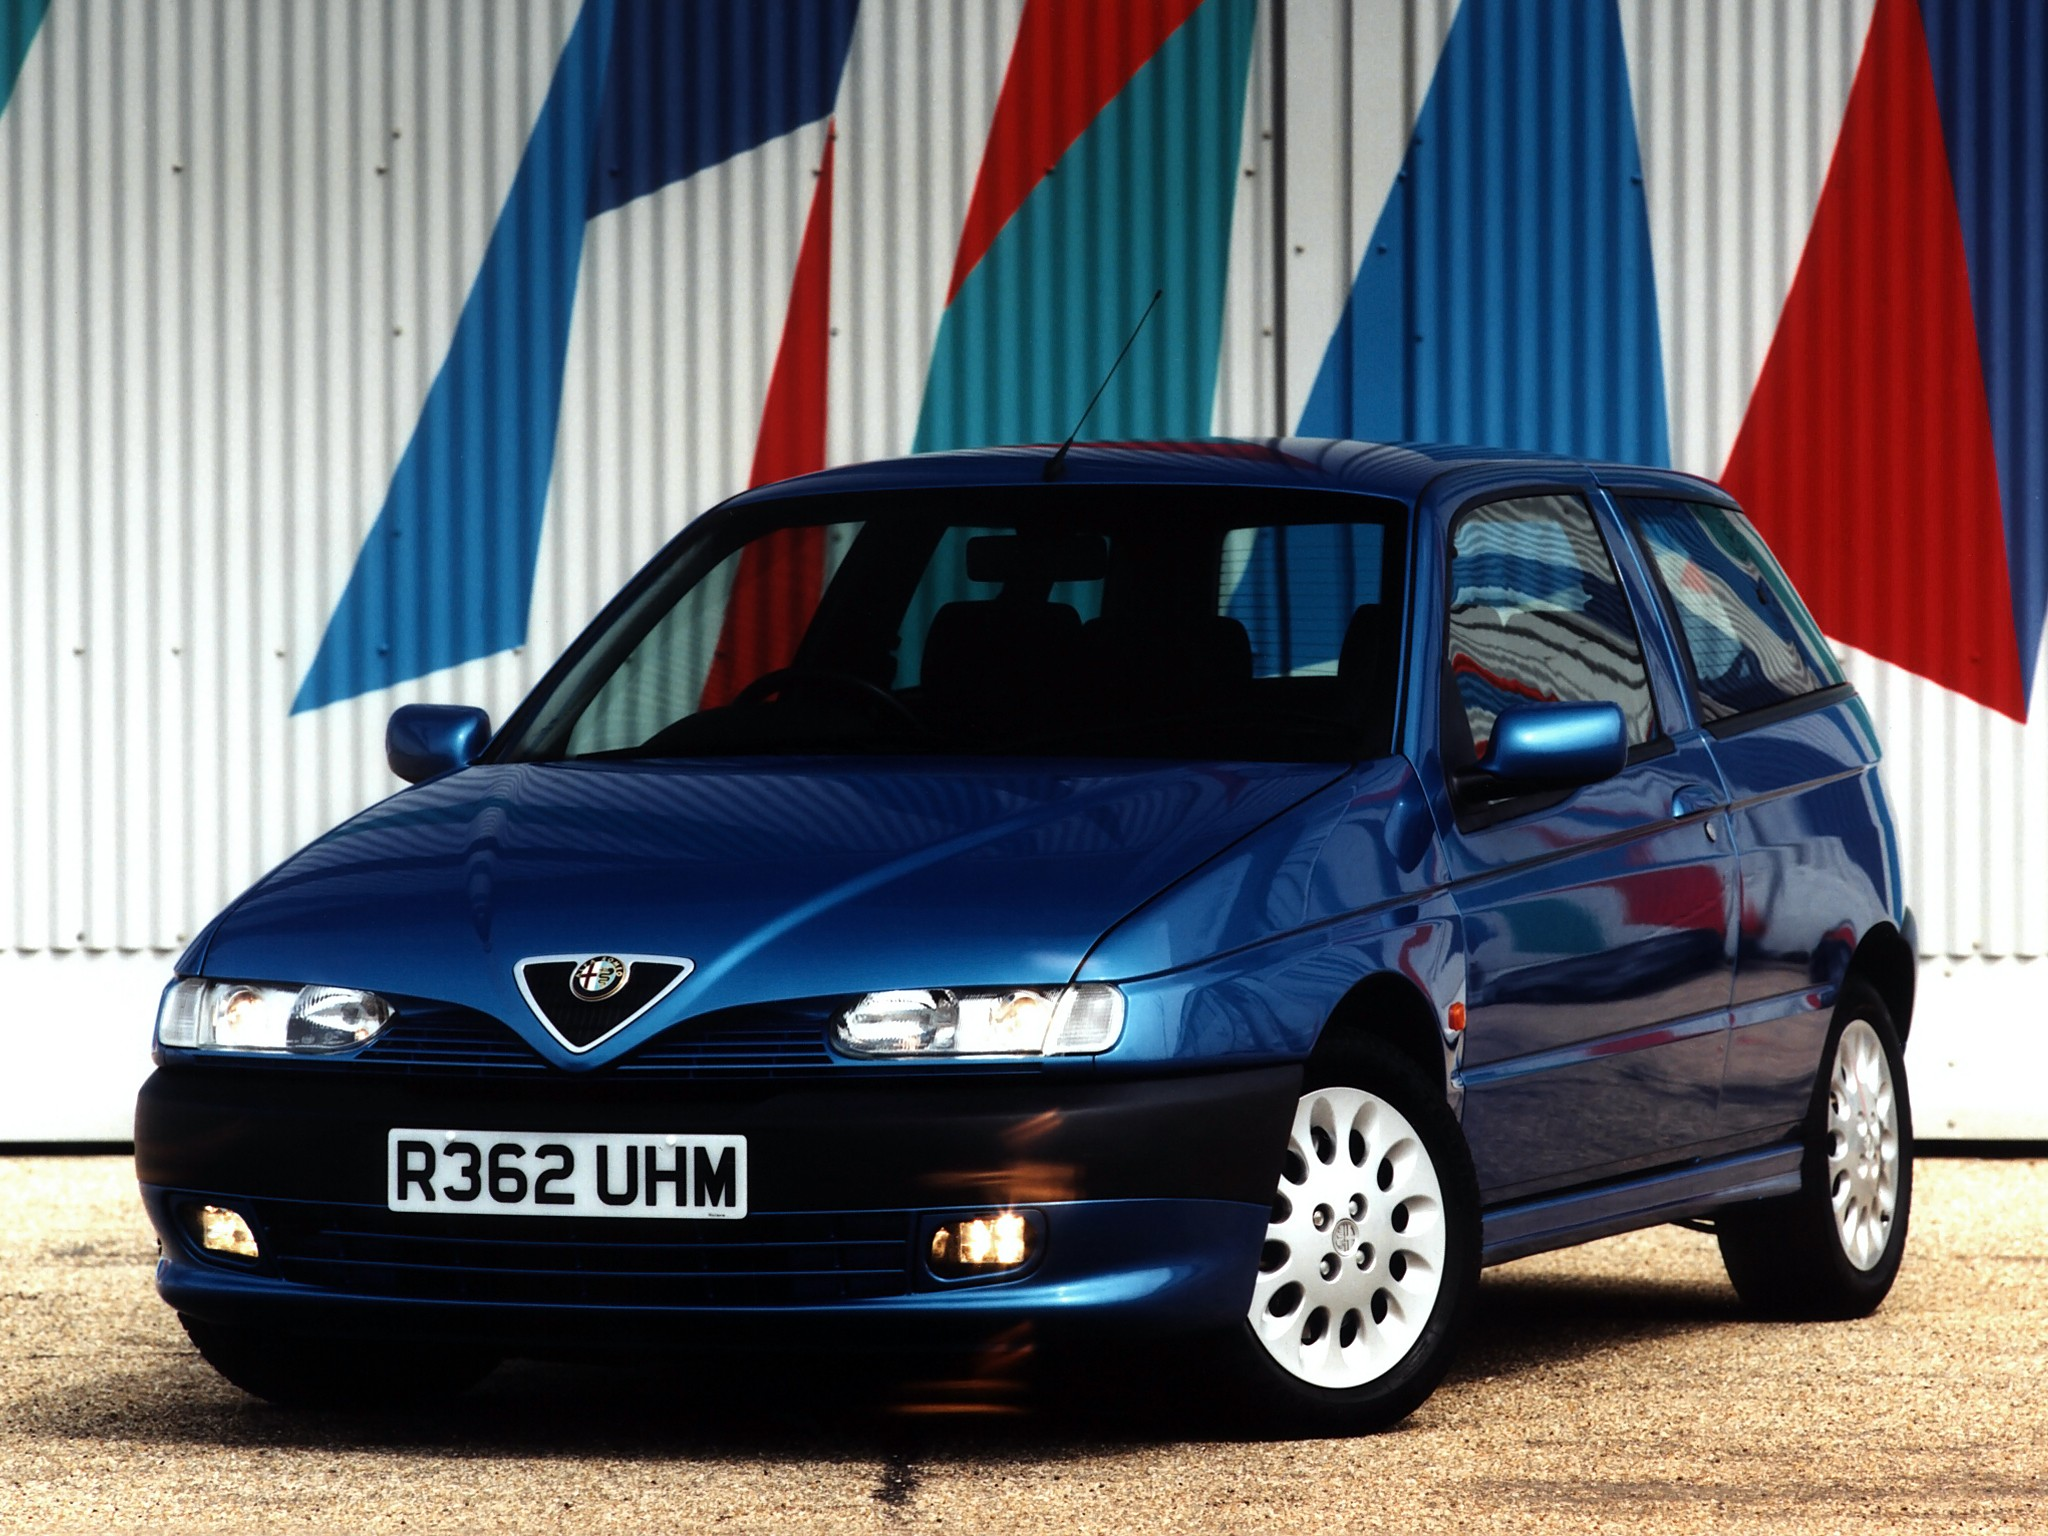 Alfa Romeo 145 Specs Photos 1994 1995 1996 1997 1998 1999 2000 Autoevolution